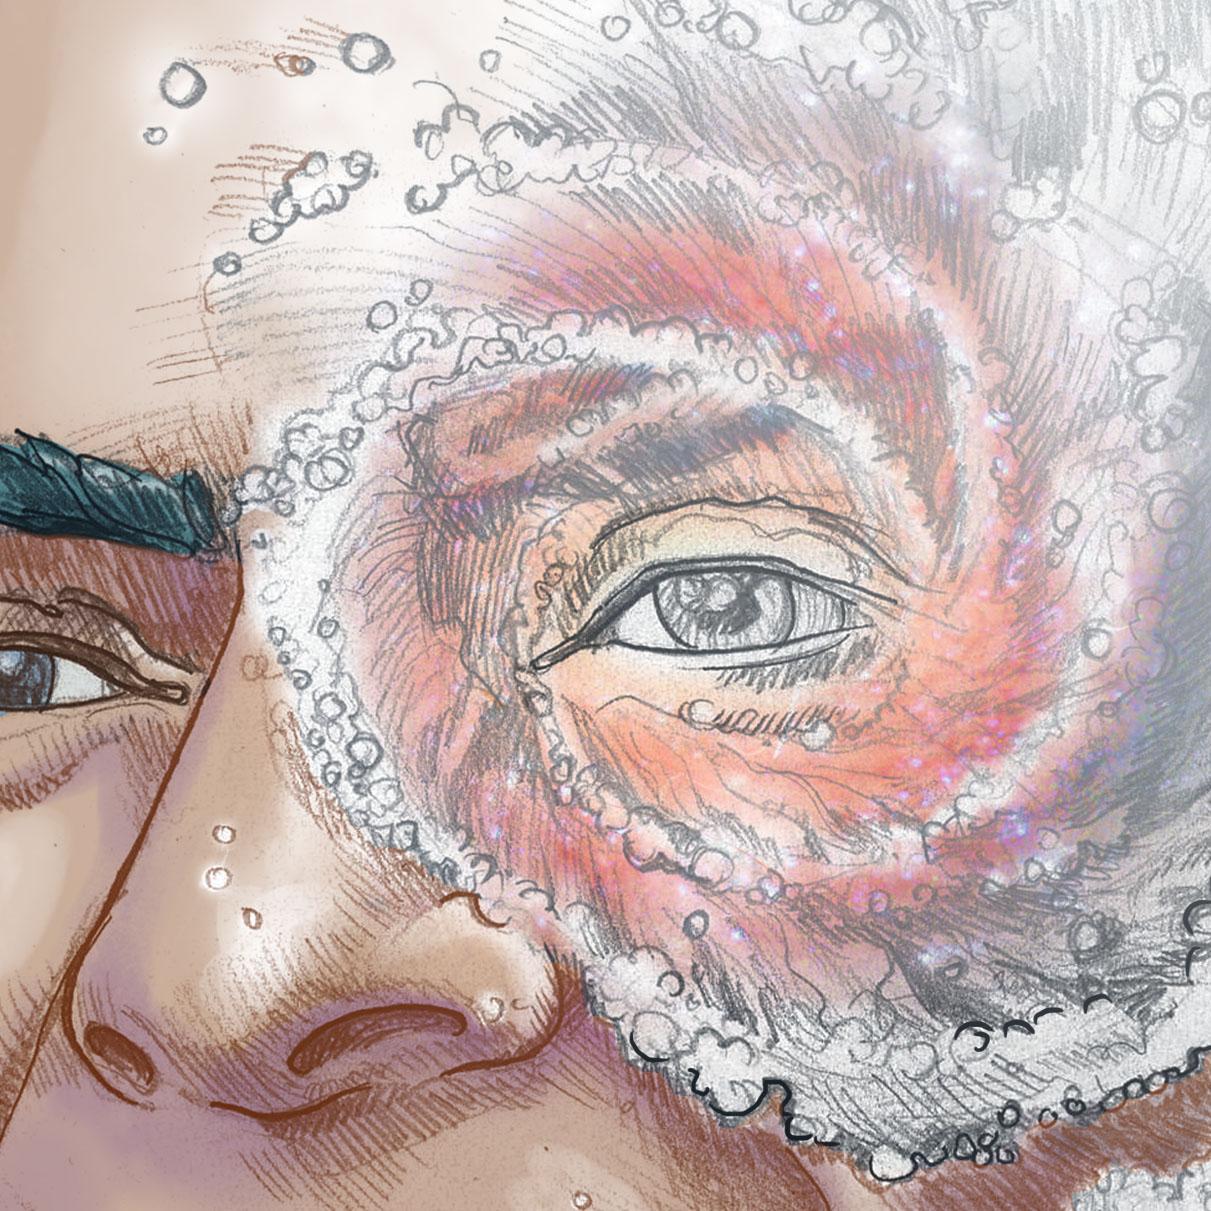 Daniel Garcia Art Illustration Carl Sagan Cosmos Universe 02